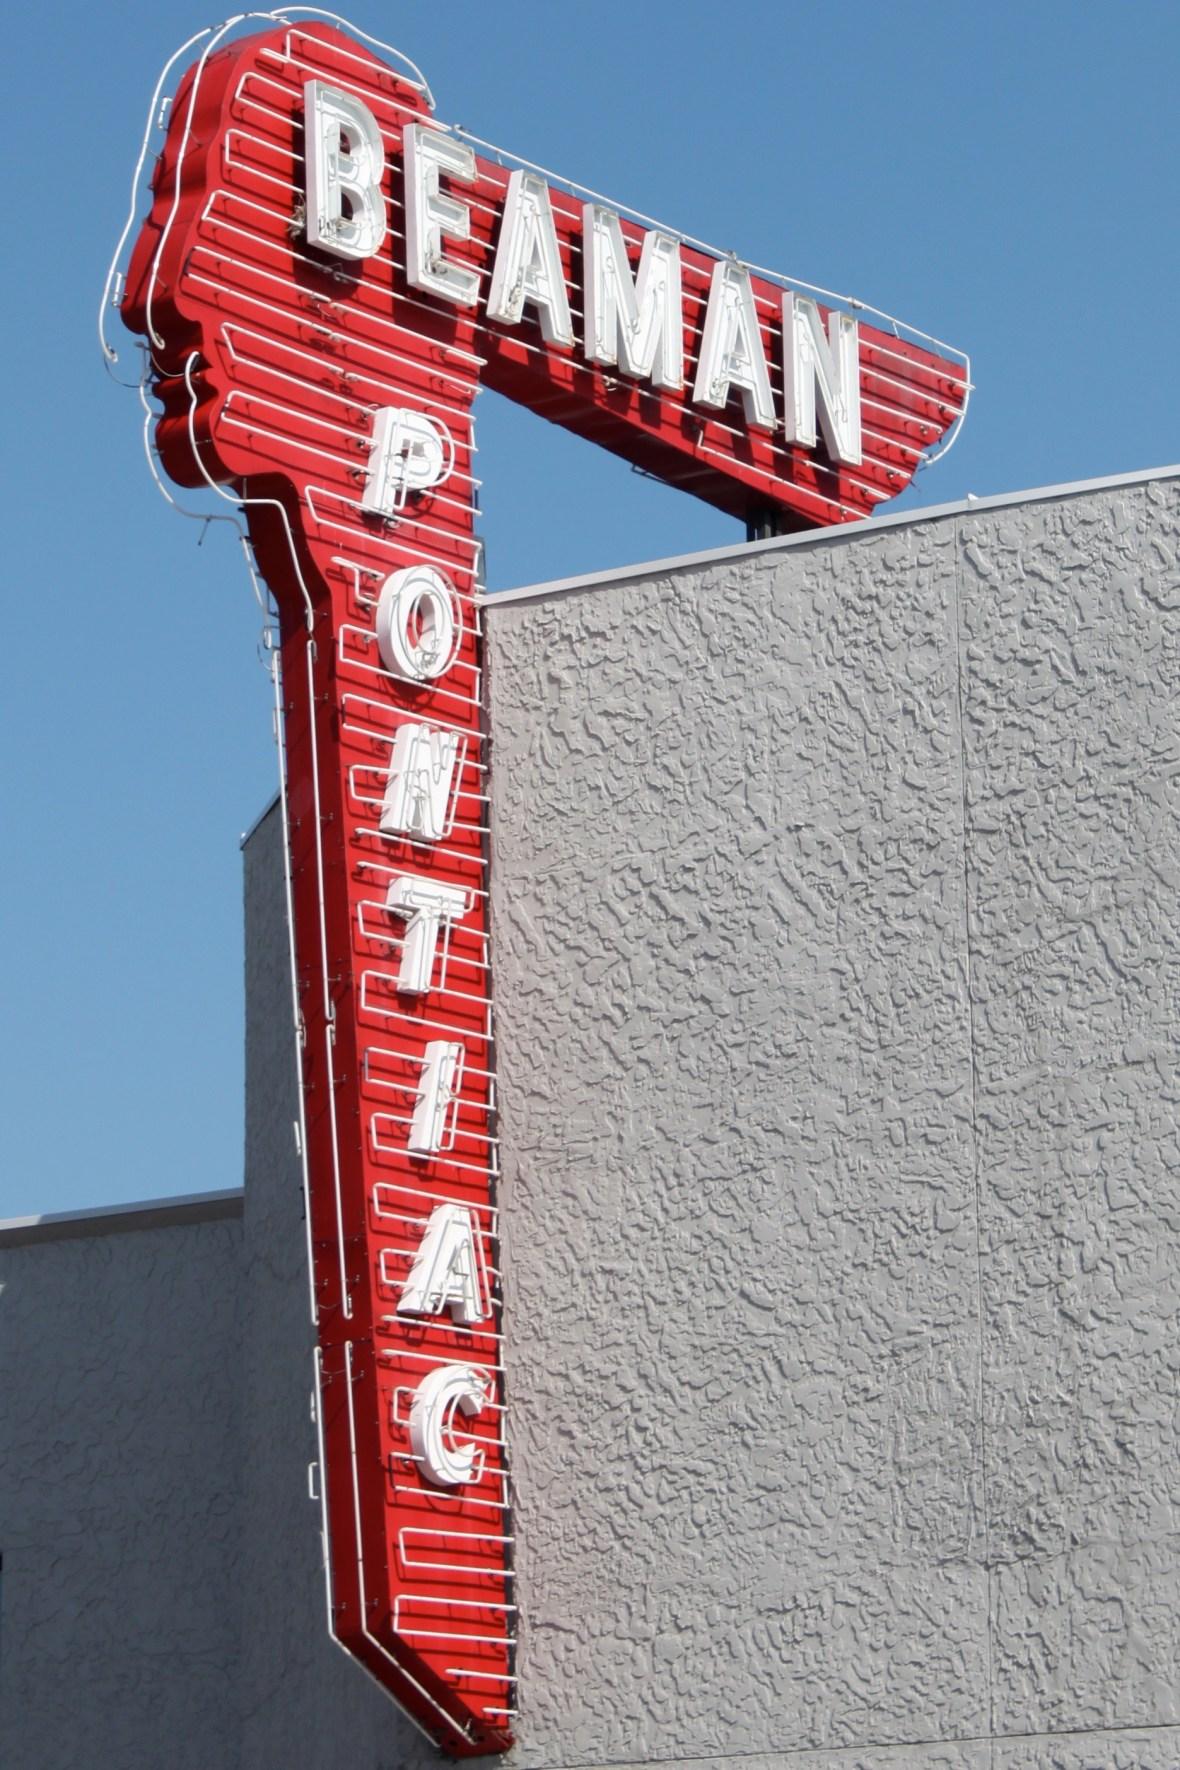 Beaman Pontiac - Nashville, Tennessee U.S.A. - August 1, 2010